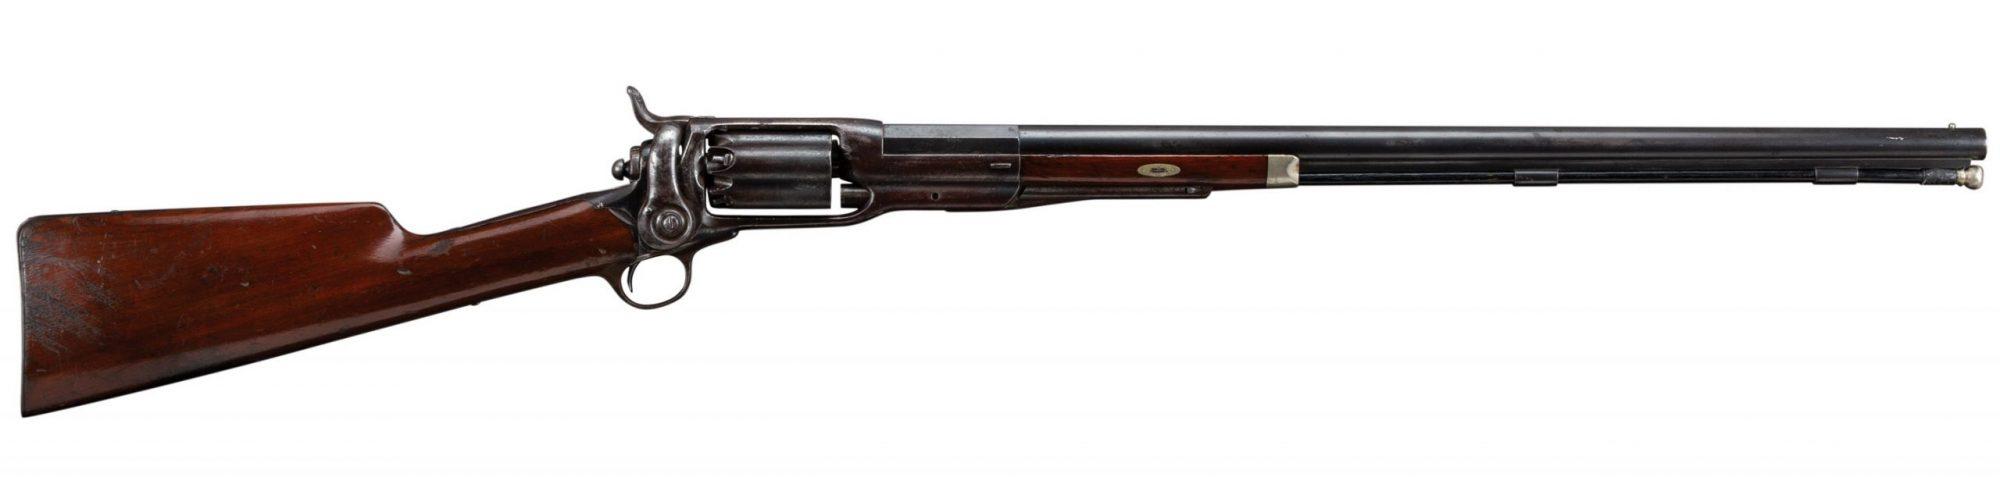 Photo of a rare Colt Model 1855 revolving 20 gauge shotgun before restoration by Turnbull Restoration of Bloomfield, NY